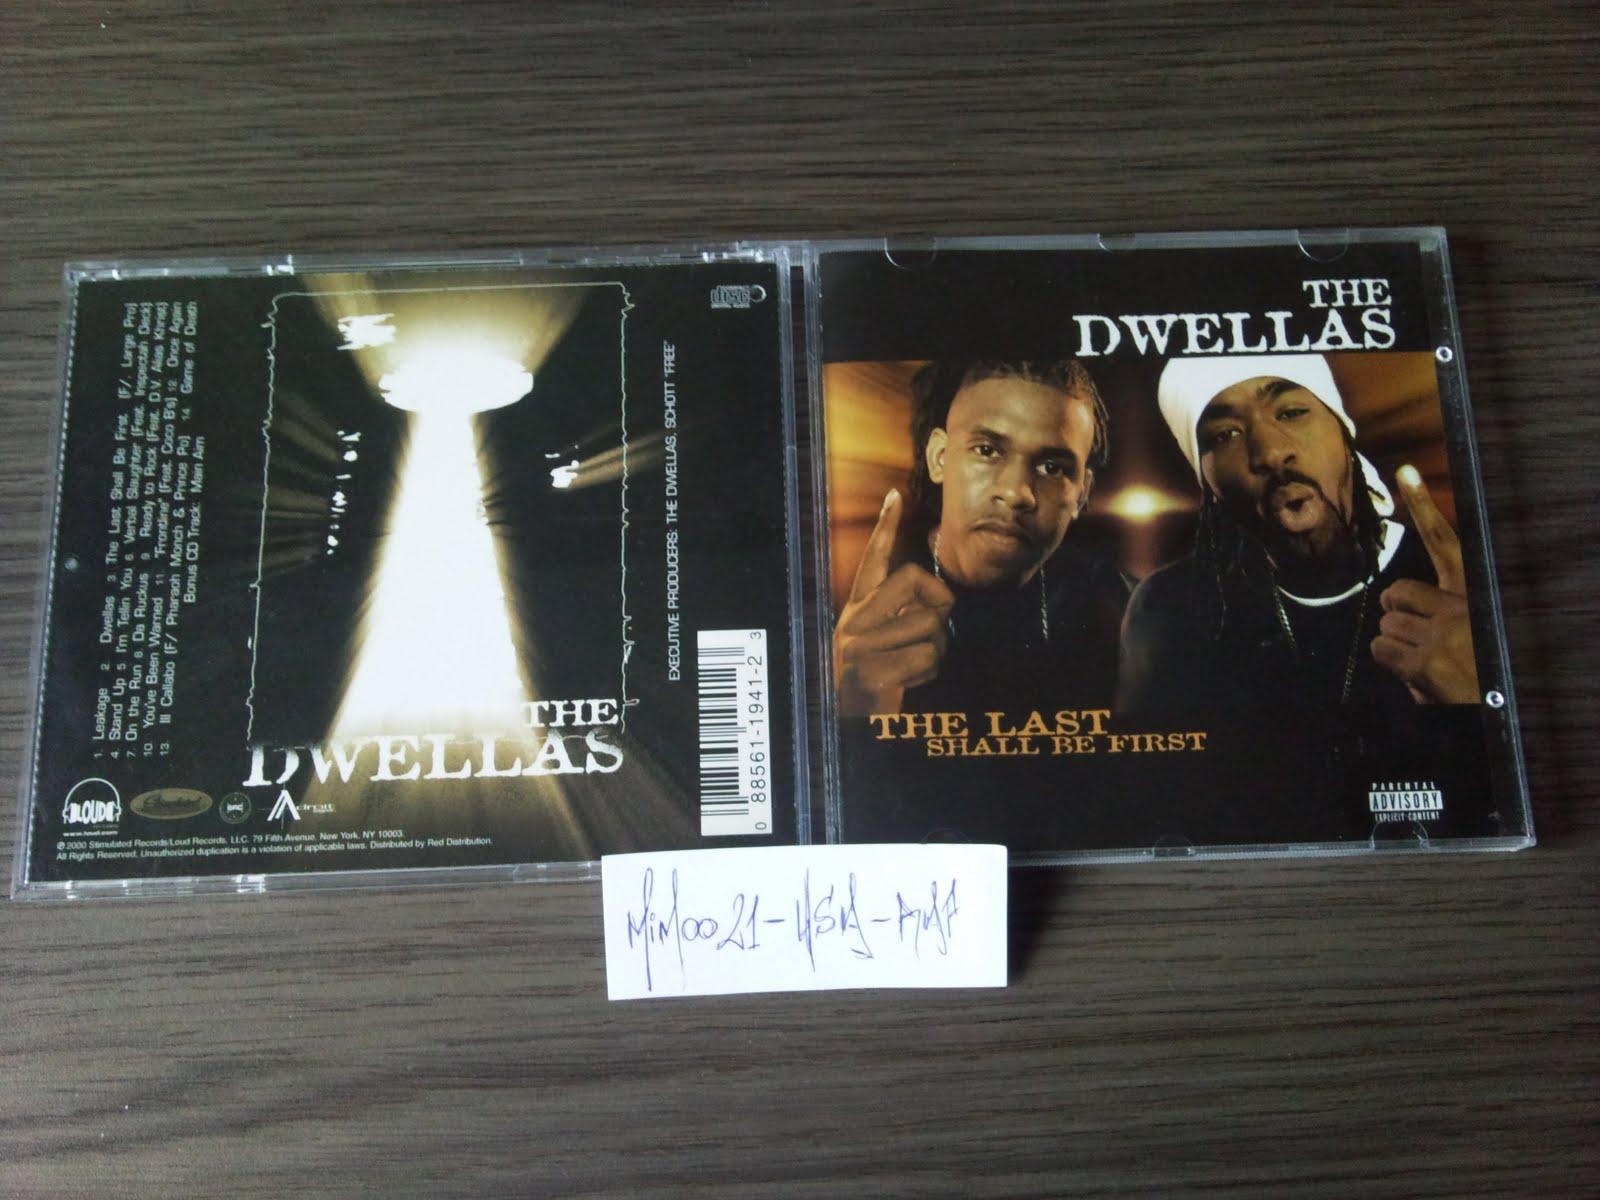 Dwellas, The - Game Of Death / Da Ruckus